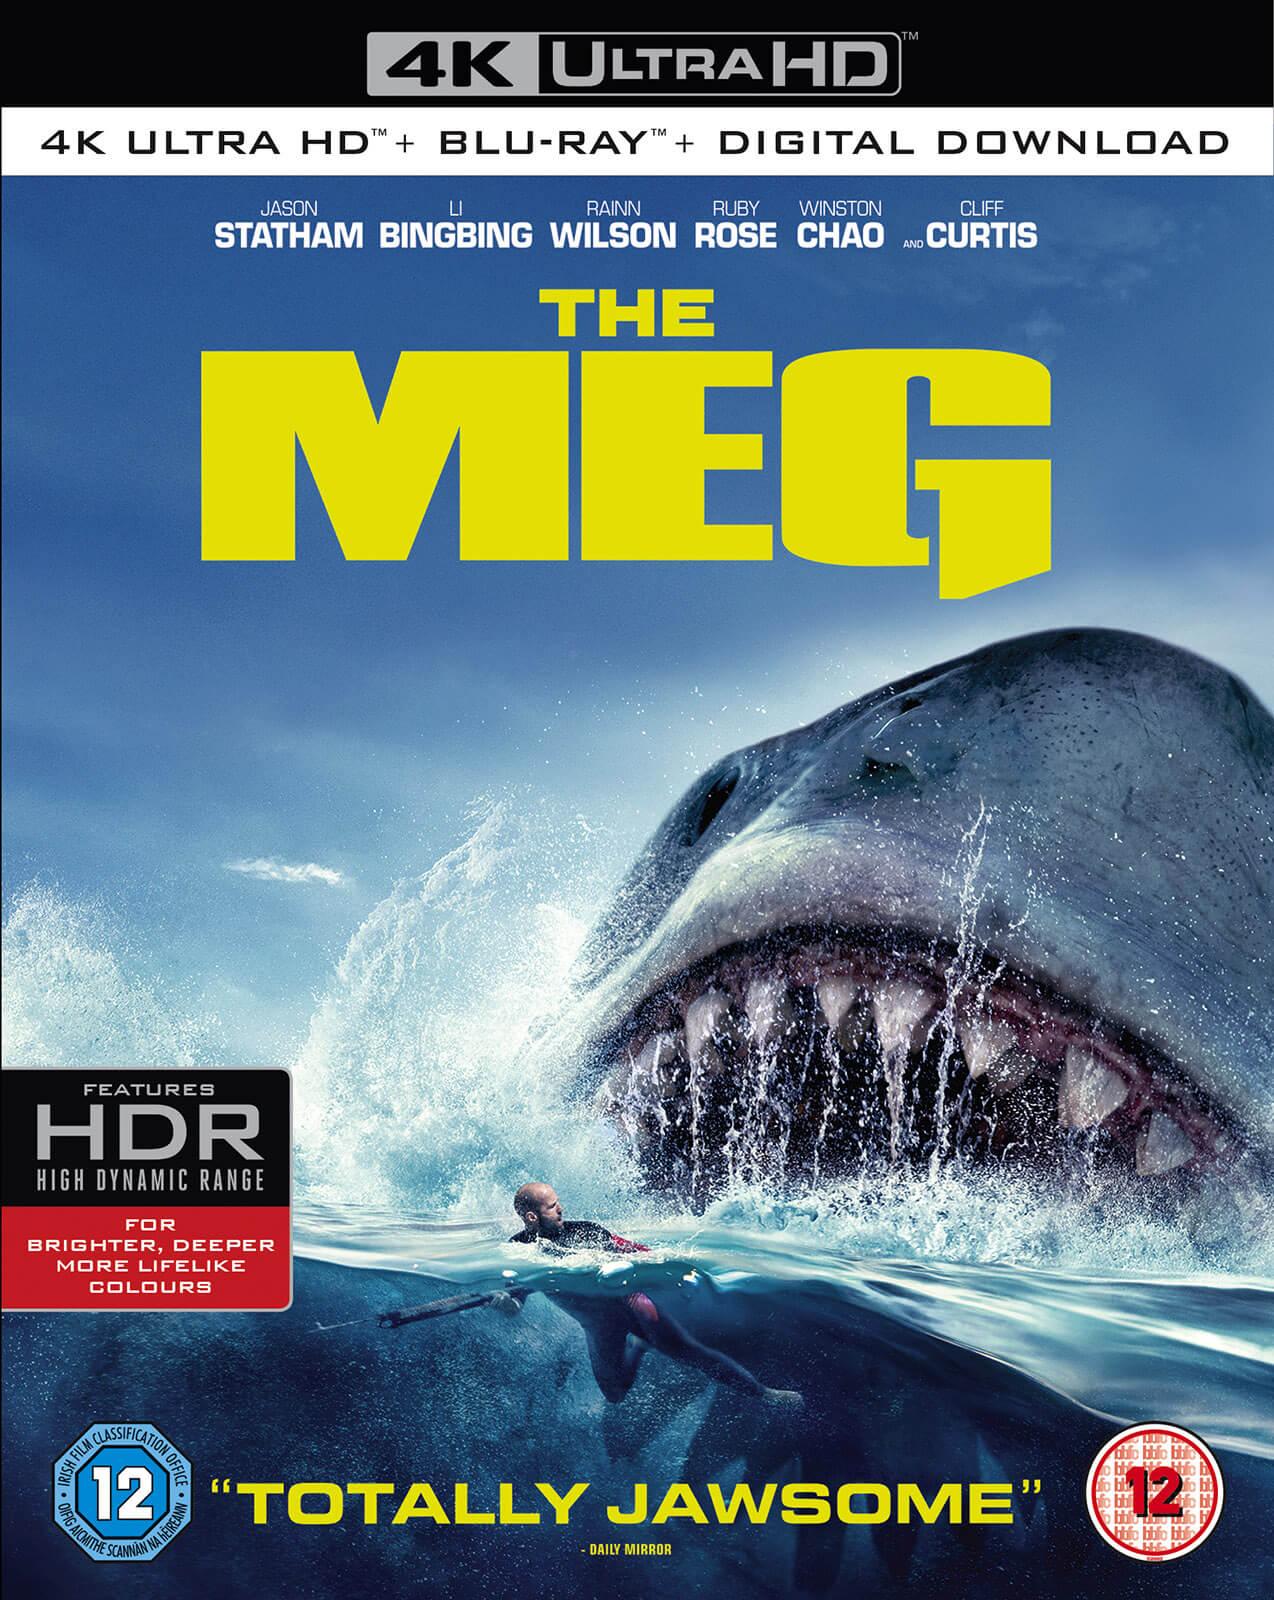 Warner Home Video The Meg - 4K Ultra HD